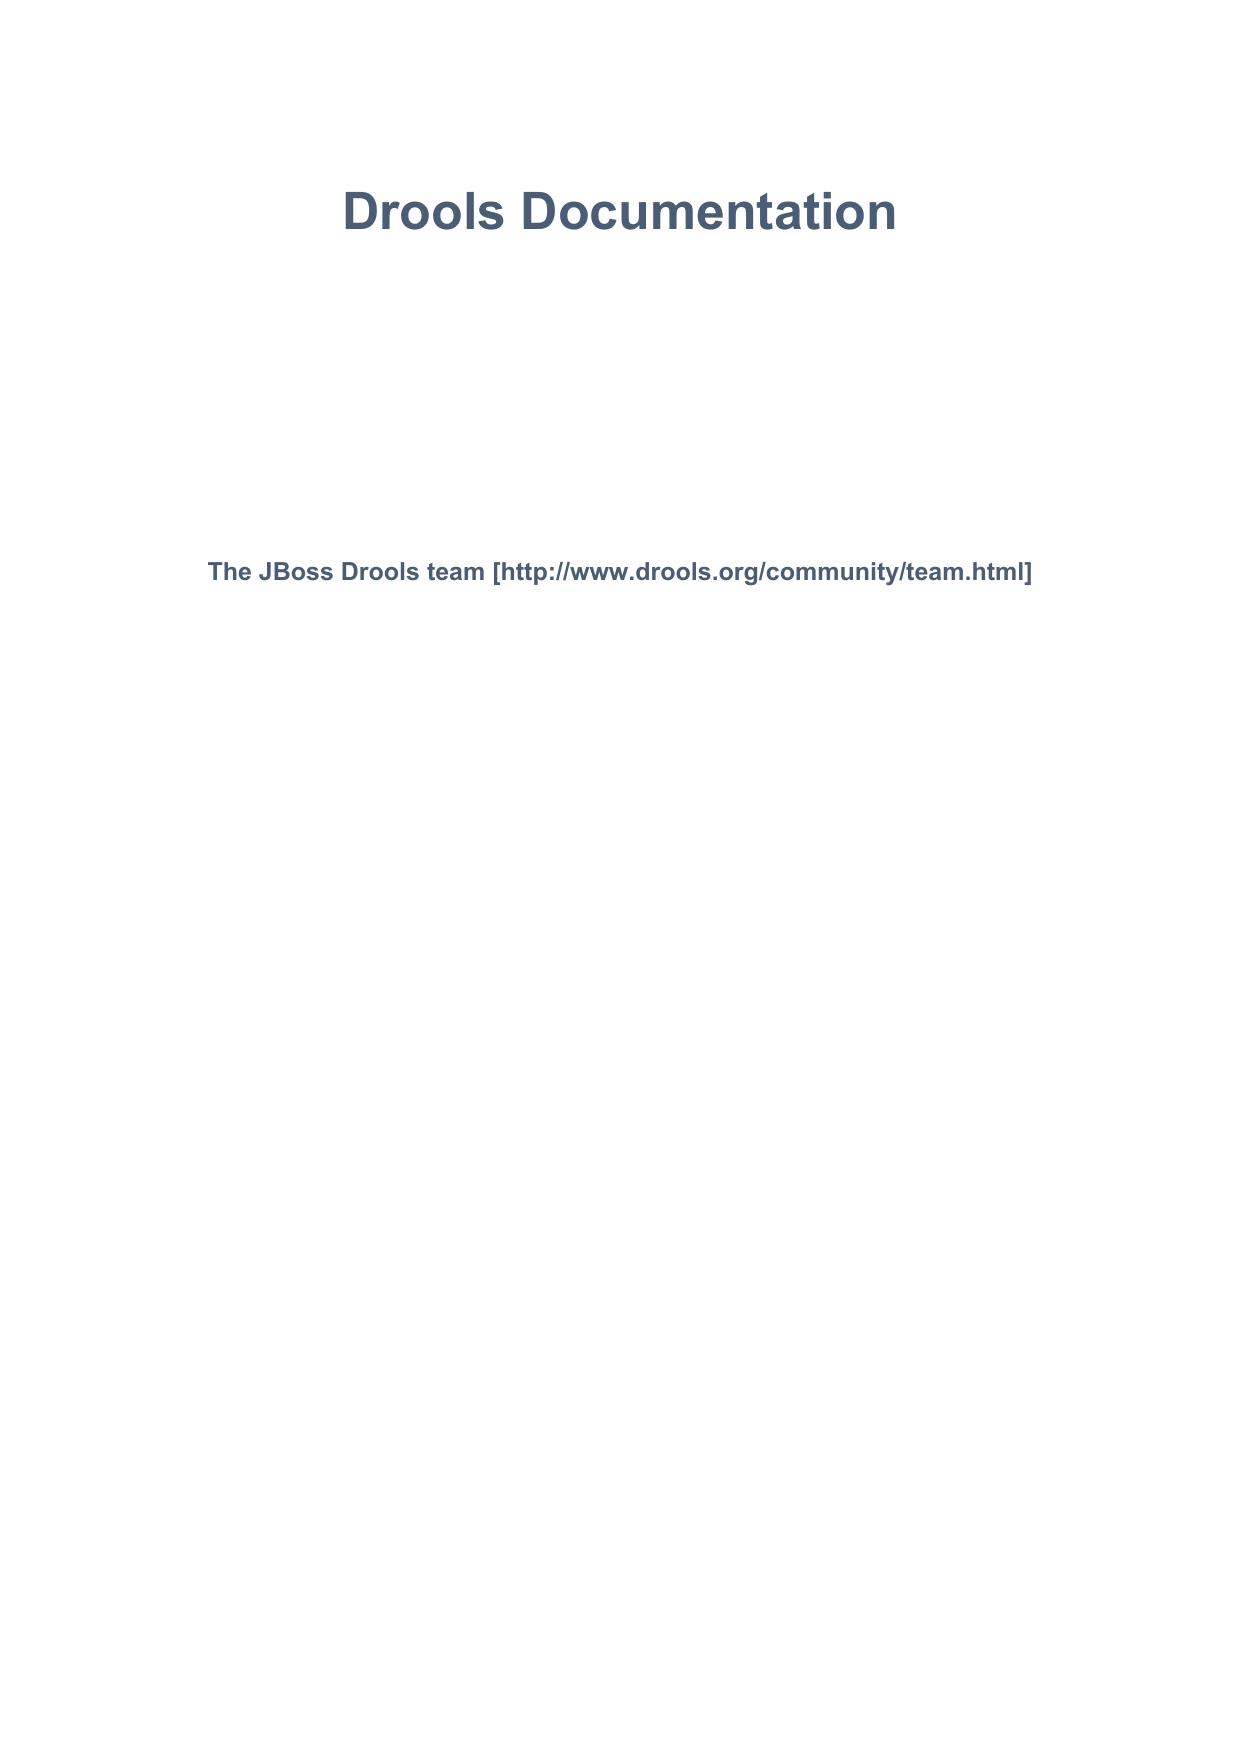 Drools Documentation - JBoss org Documentation | manualzz com